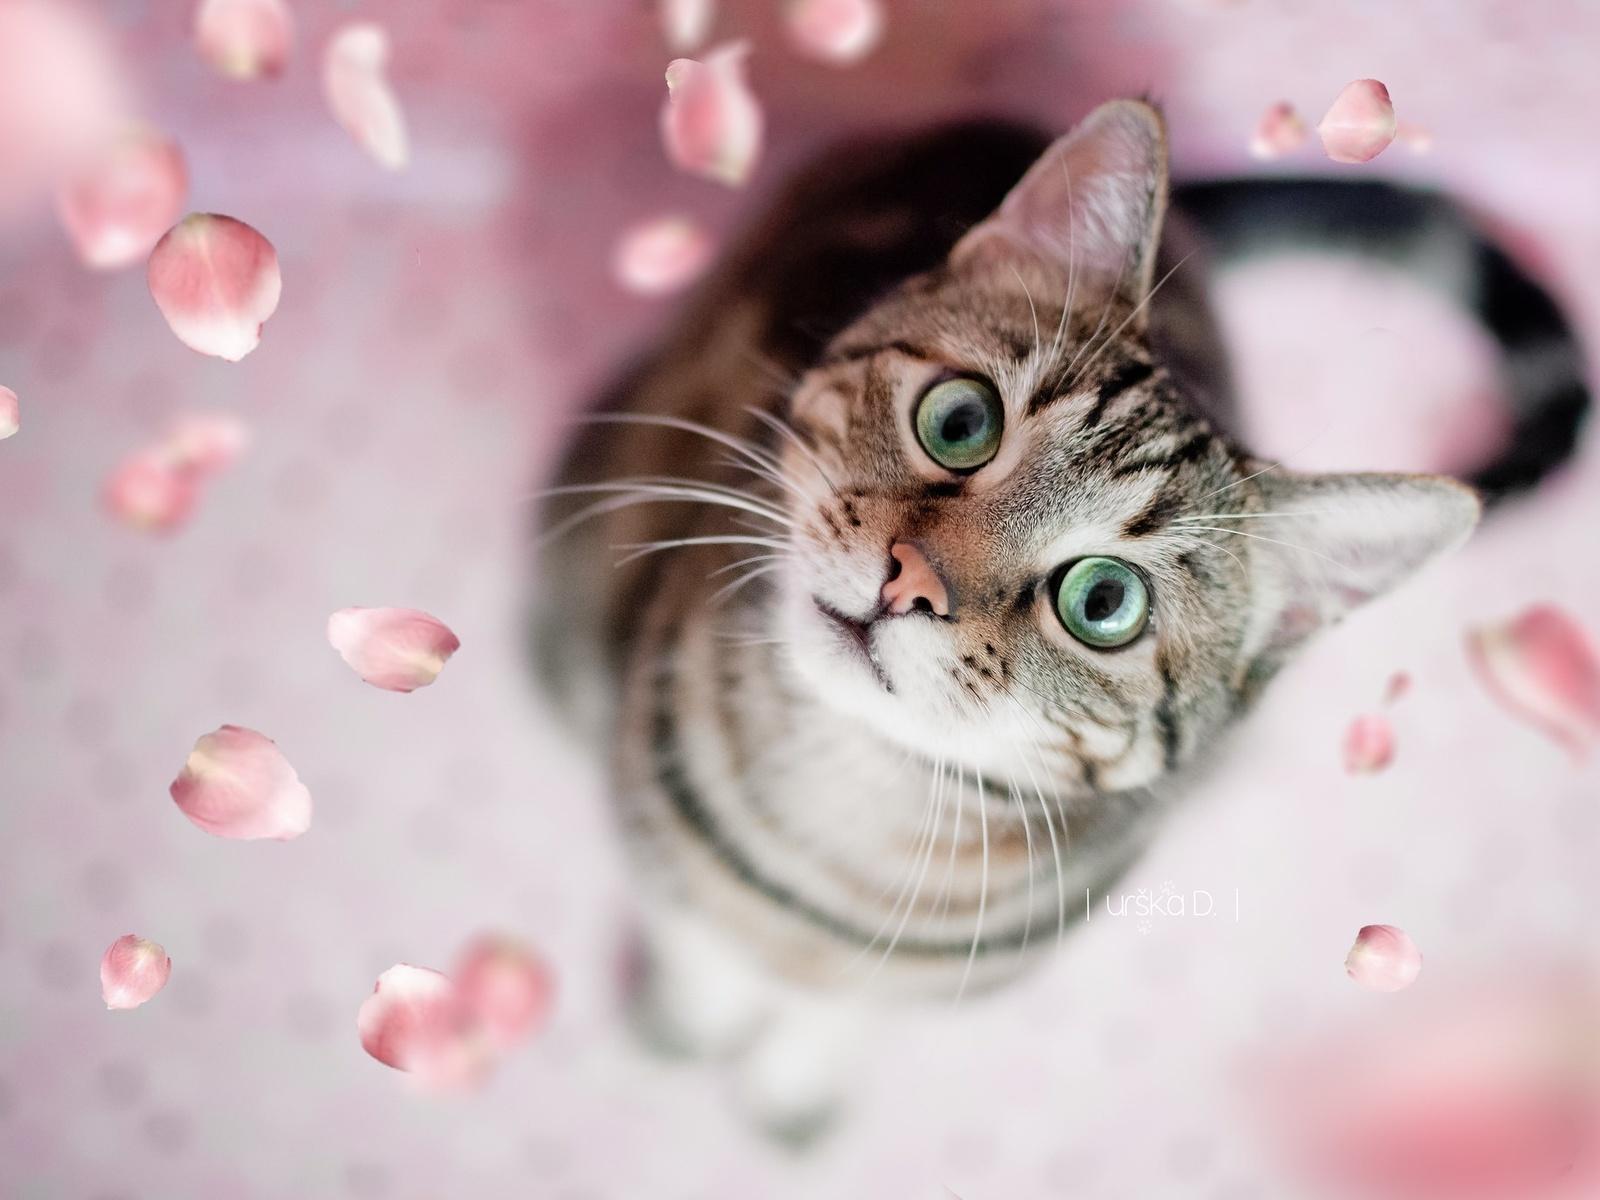 животное, кот, кошка, взгляд, лепестки